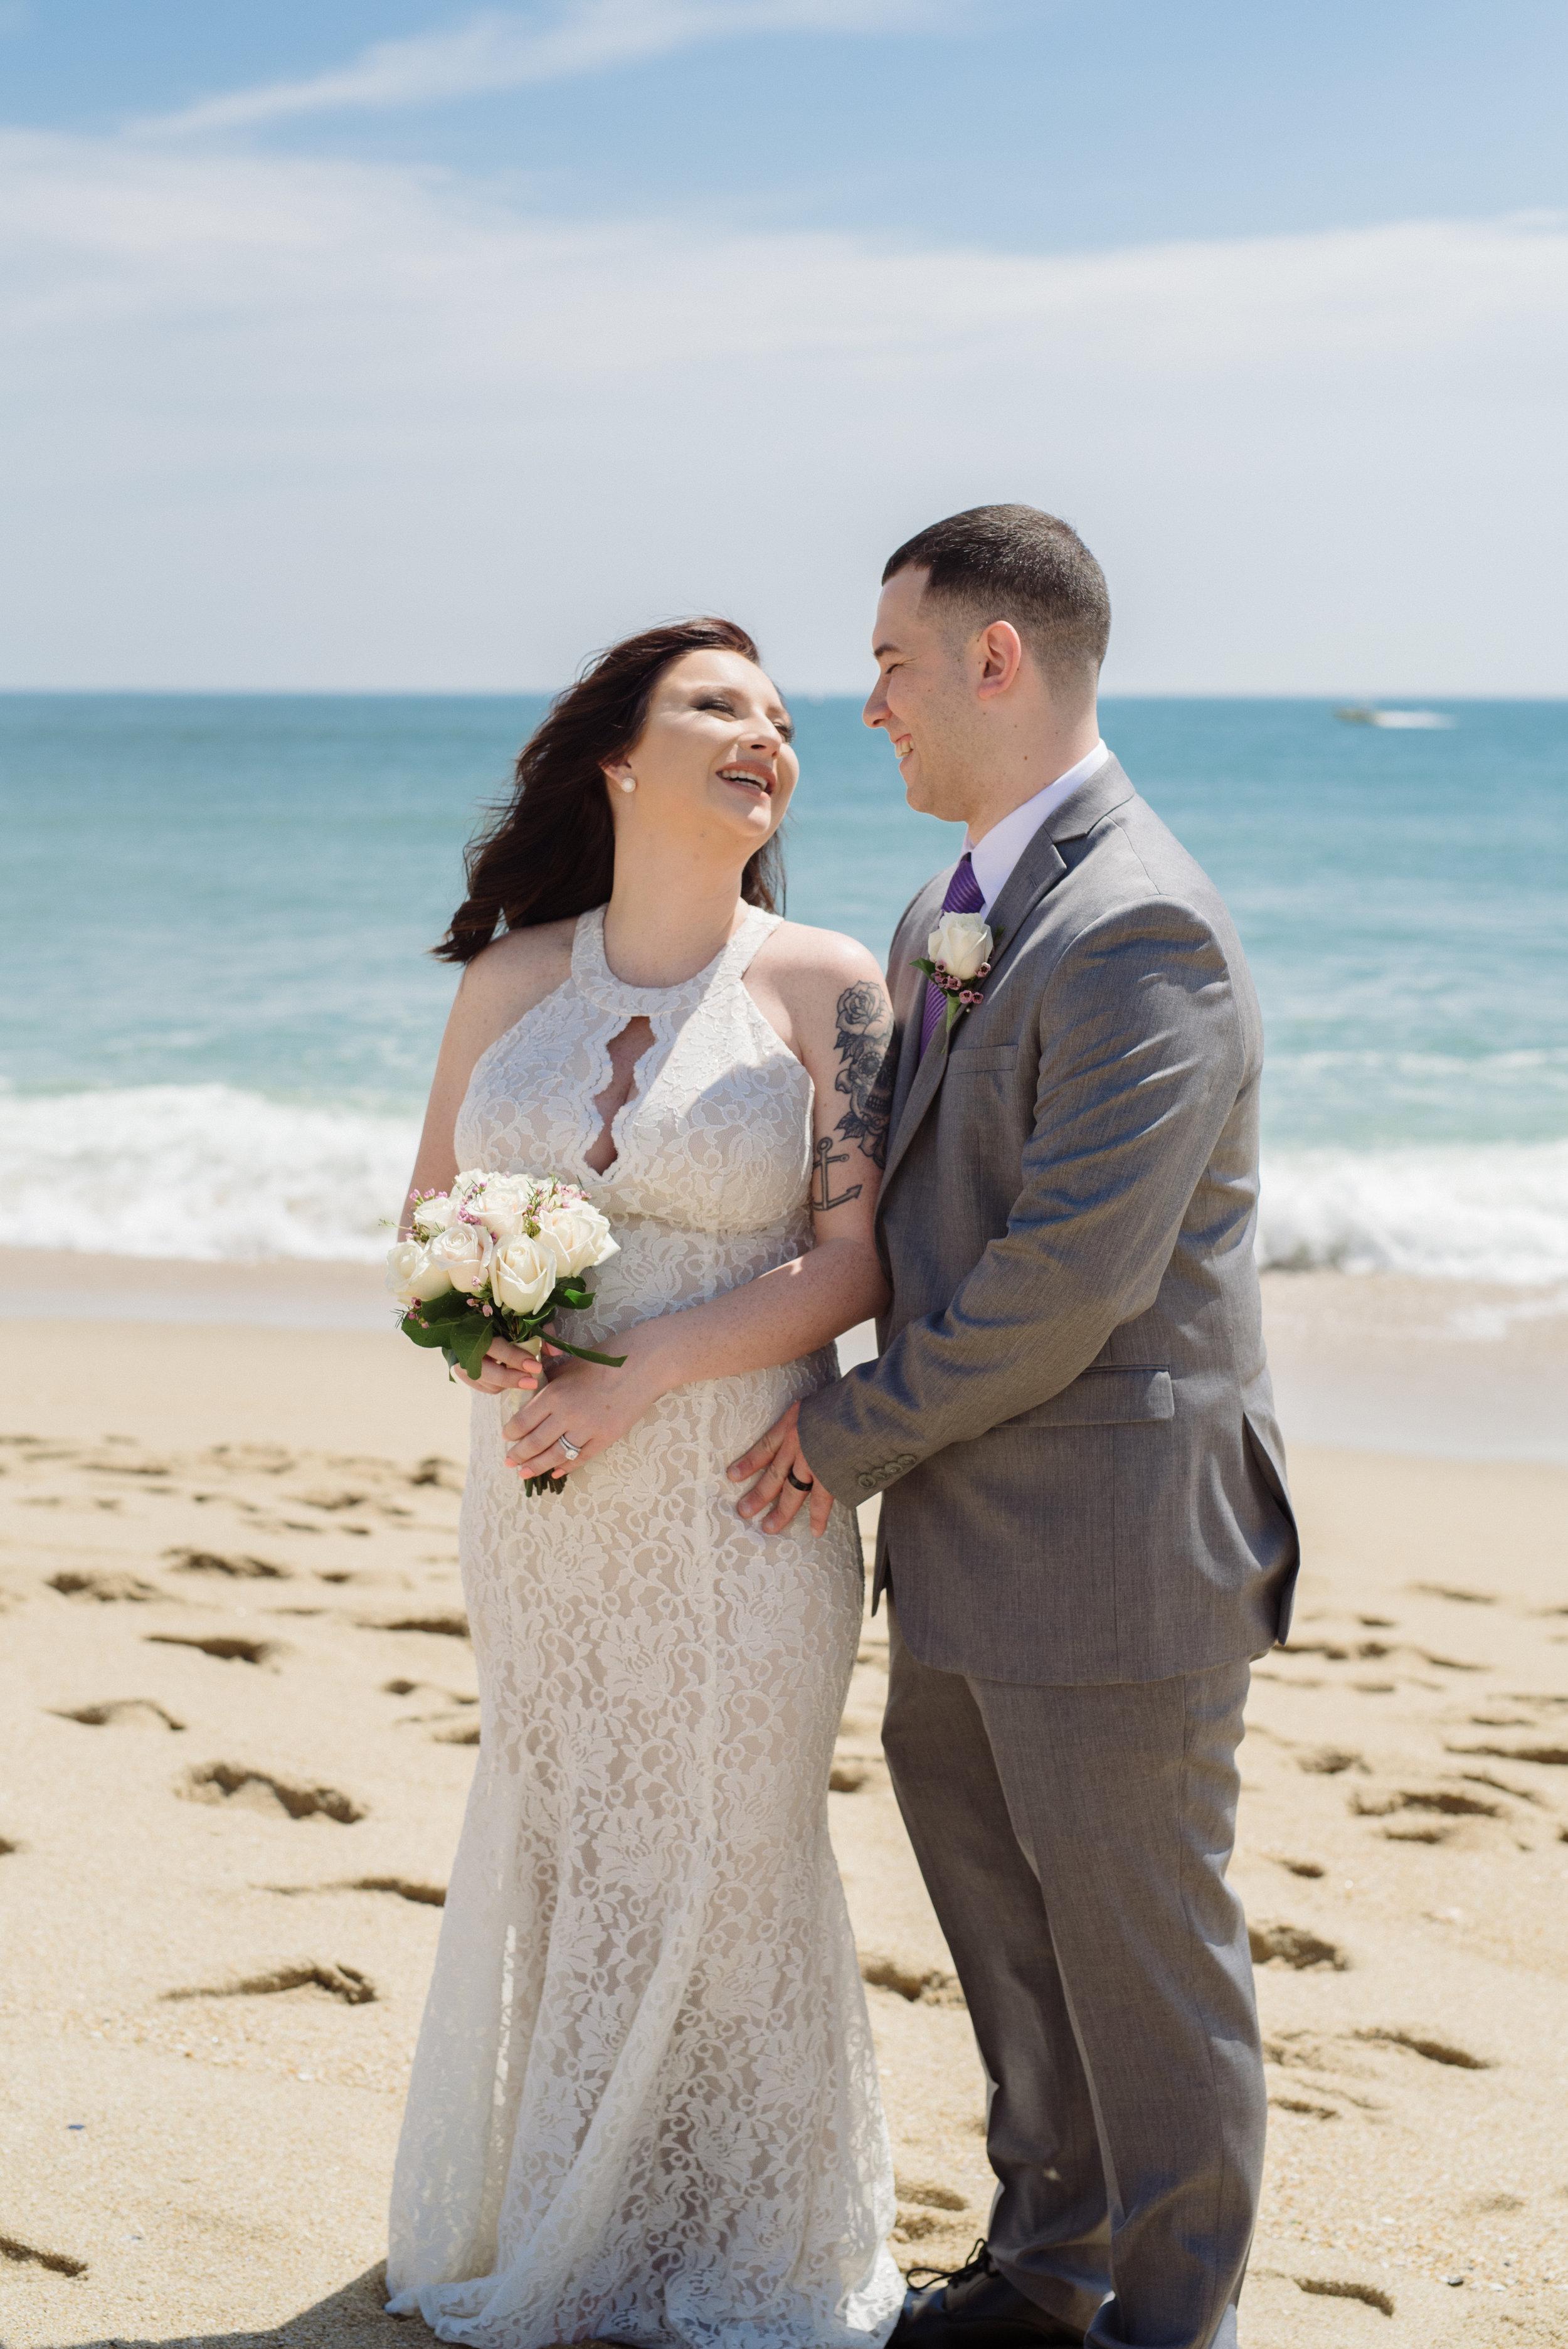 Caitlyn+Anthony- Belmar Beach Elopement- New Jersey Weddings- Olivia Christina Photo-128.JPG